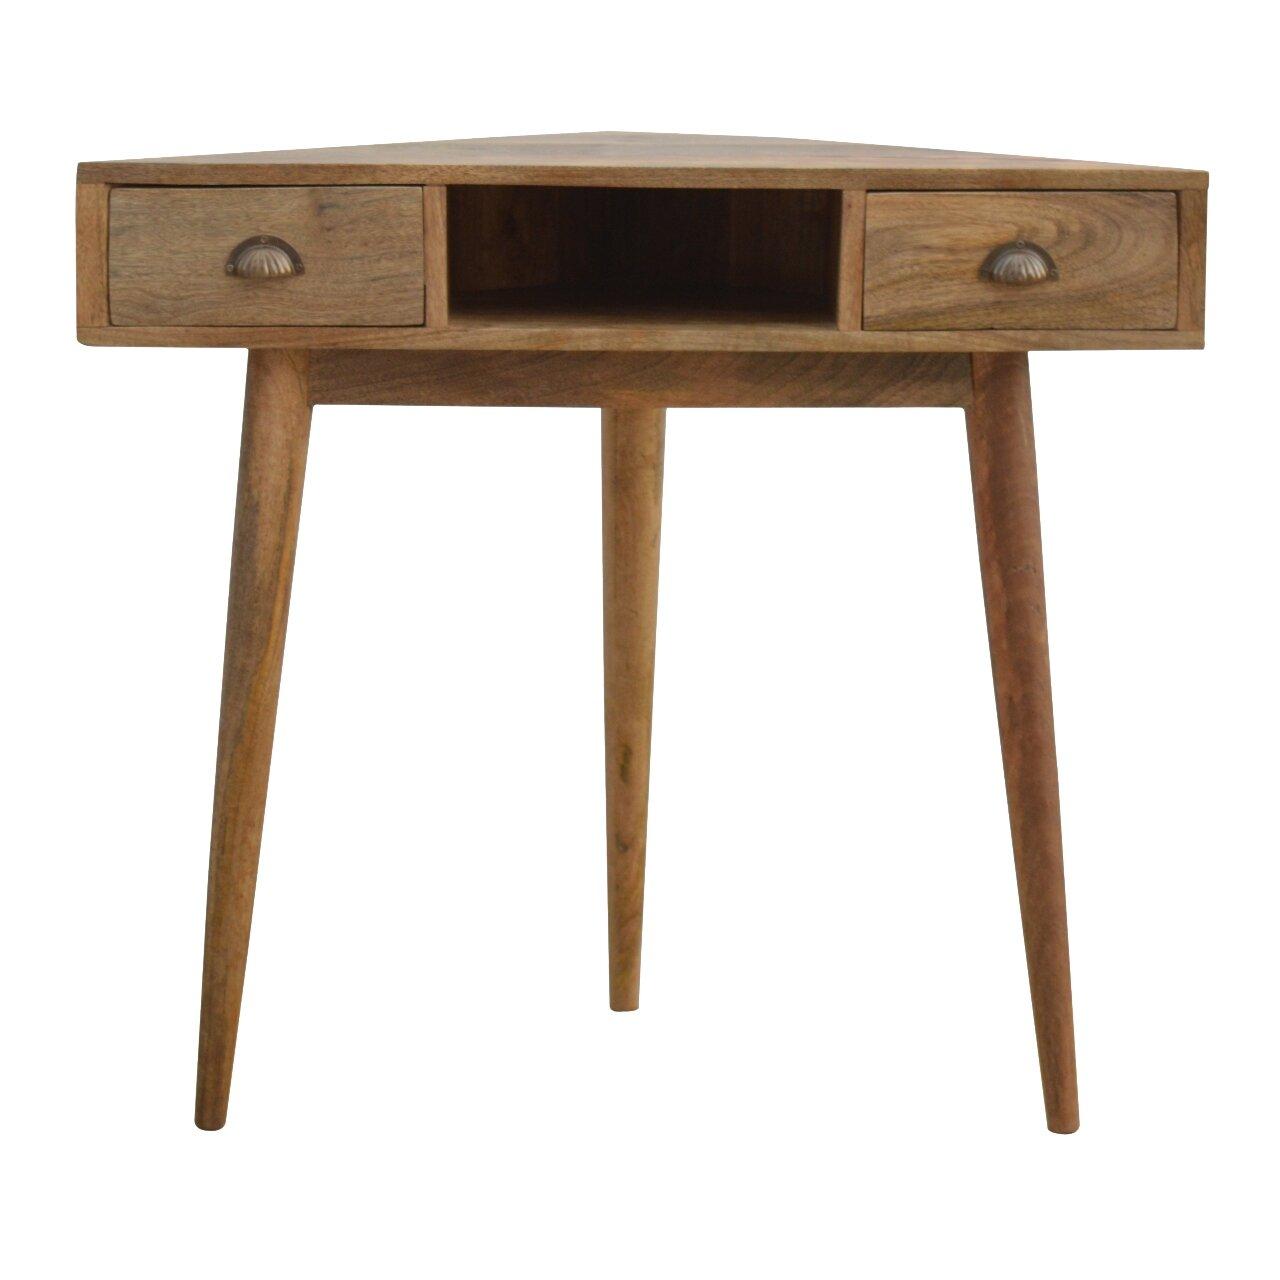 Wondrous Corner Solid Wood Desk Download Free Architecture Designs Embacsunscenecom